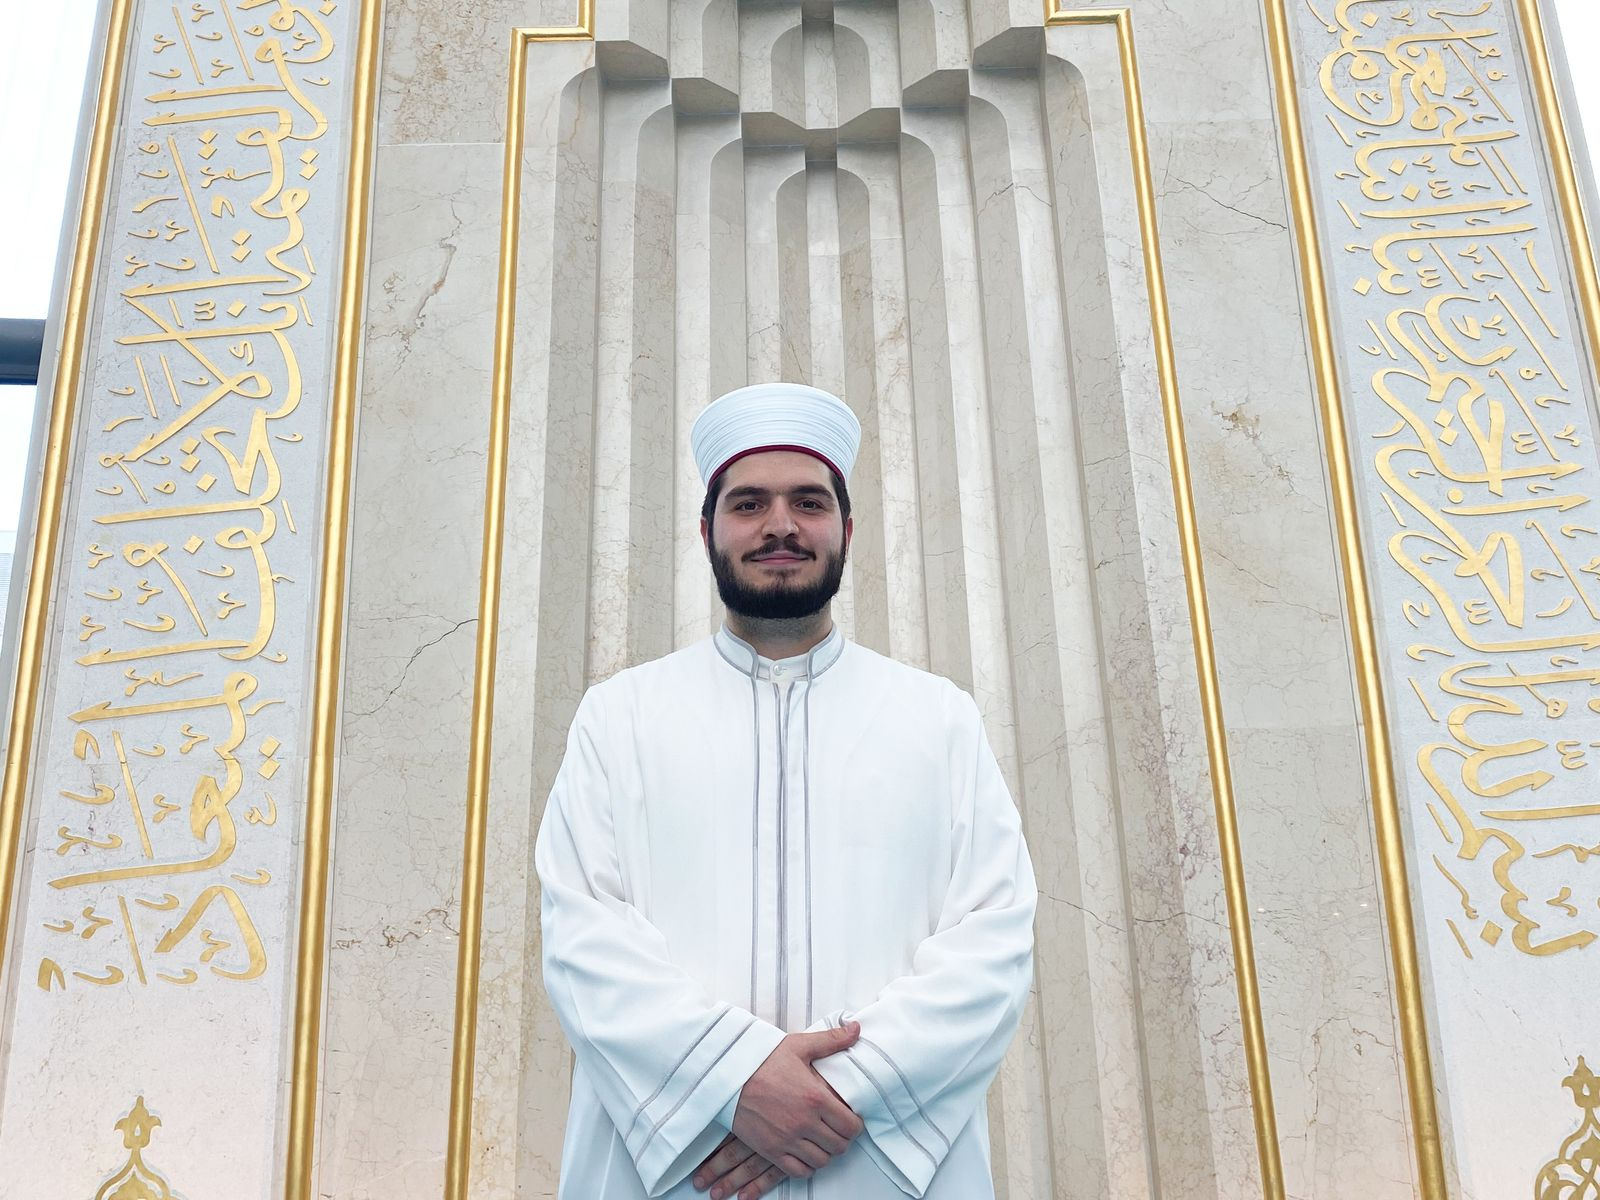 MEJIJ / Imam / Mustafa Kader